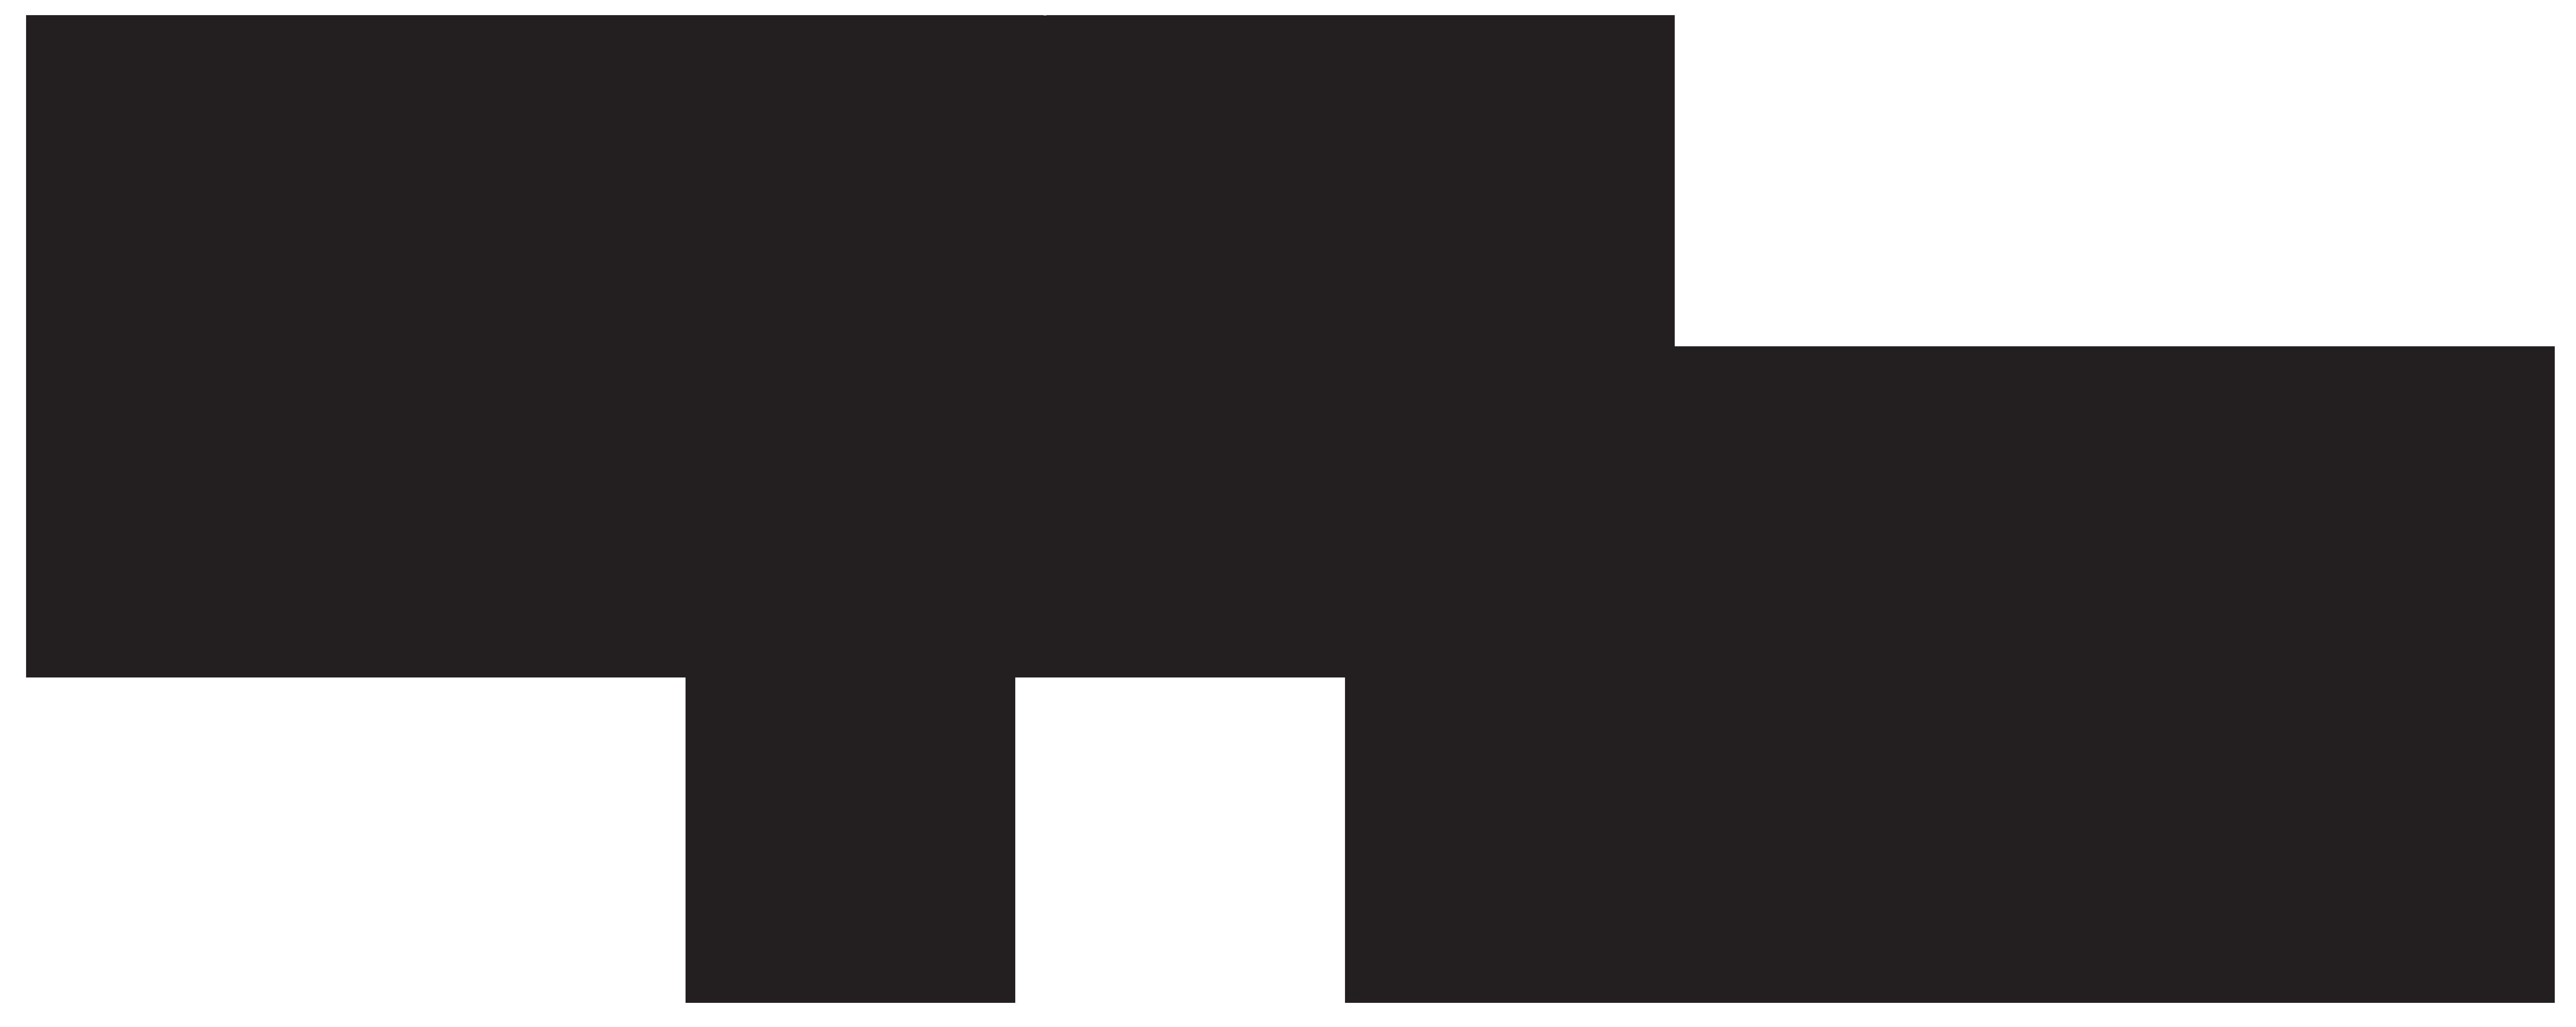 Dolphin clipart silhouette. Hammerhead shark png clip